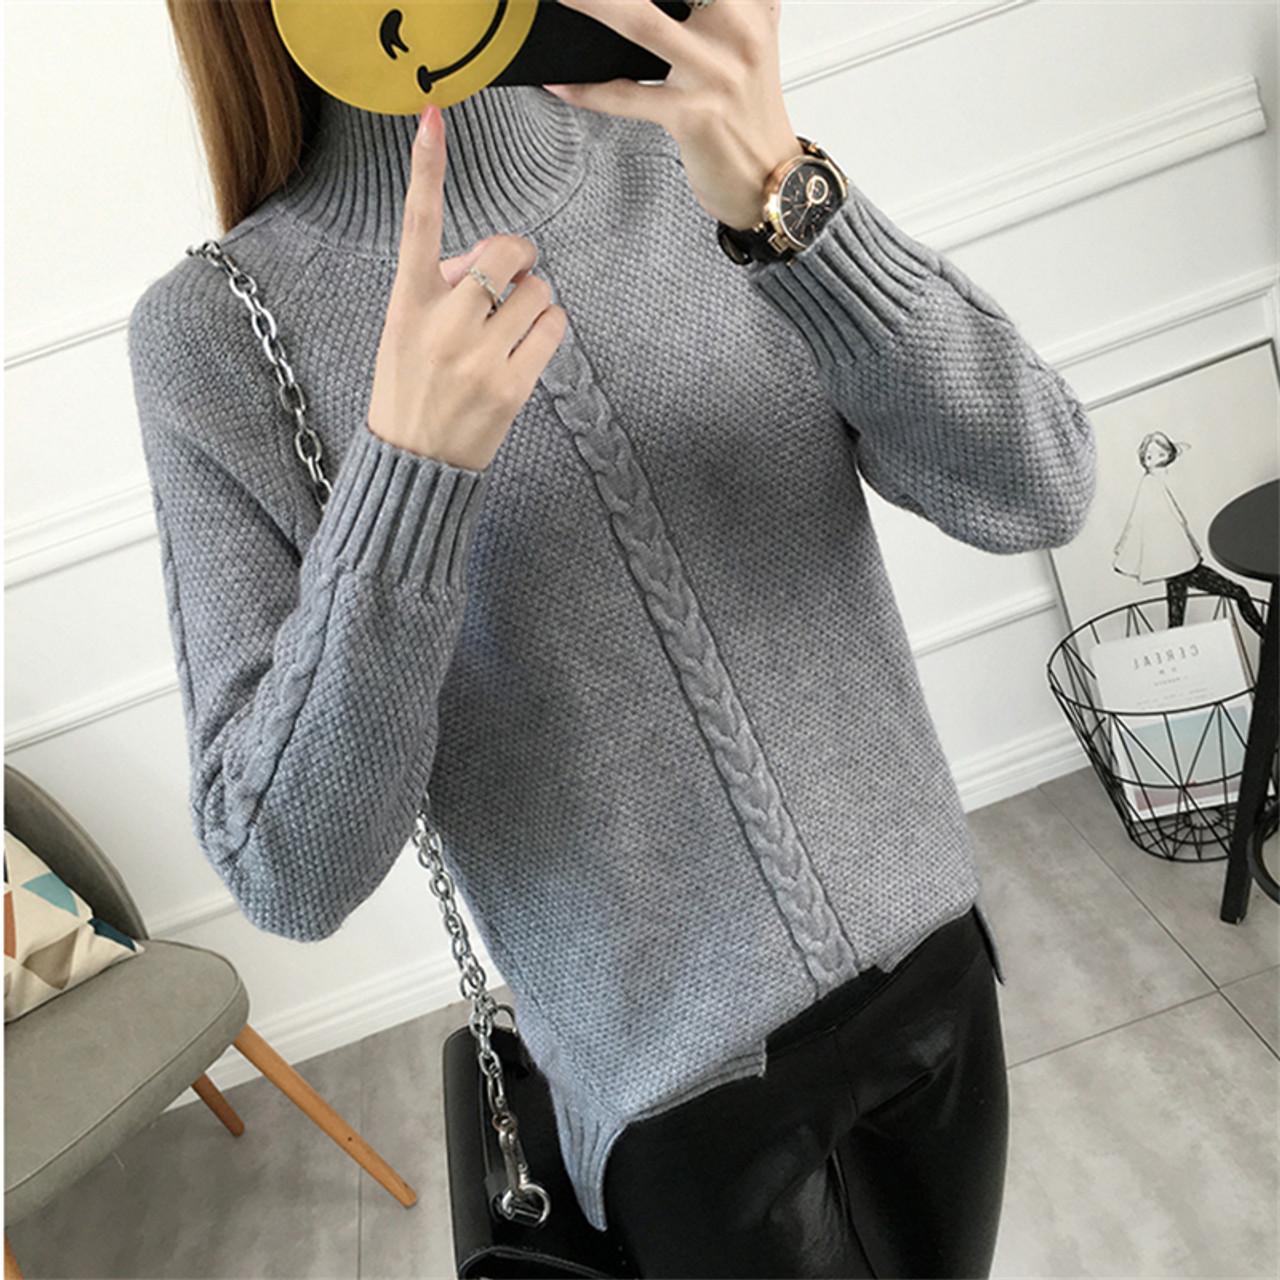 683285ea1b801 ... Women s Turtlenecks New Warm Tops Autumn Winter Women Sweater Knitting  Pullovers Long Sleeve Loose Knitted Sweater ...